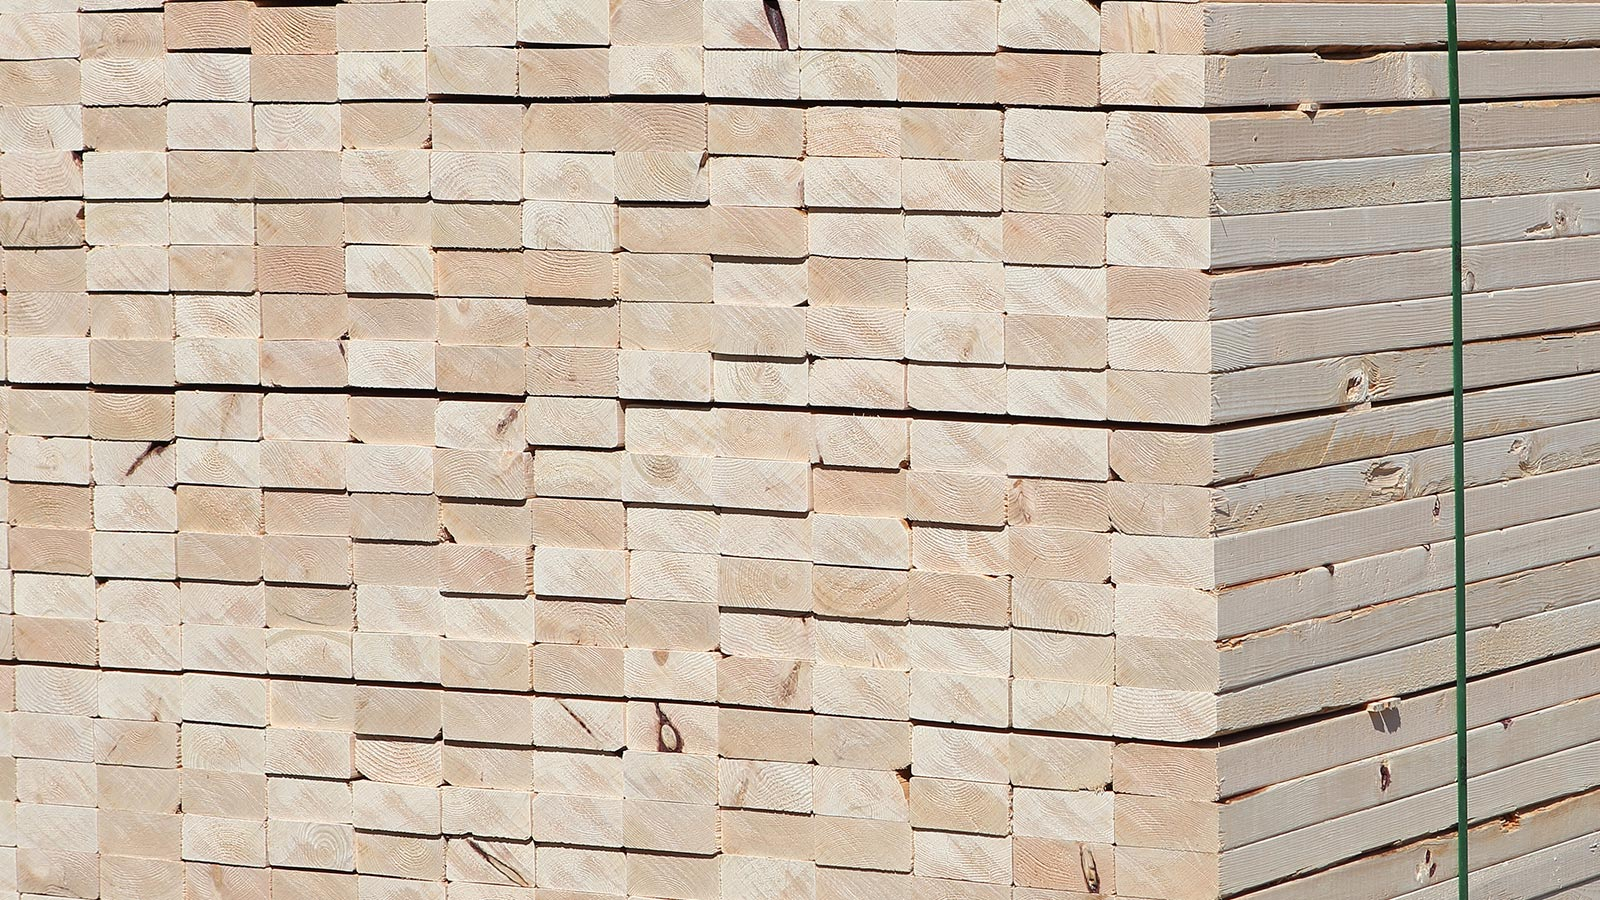 Tolko hemlock lumber stacked